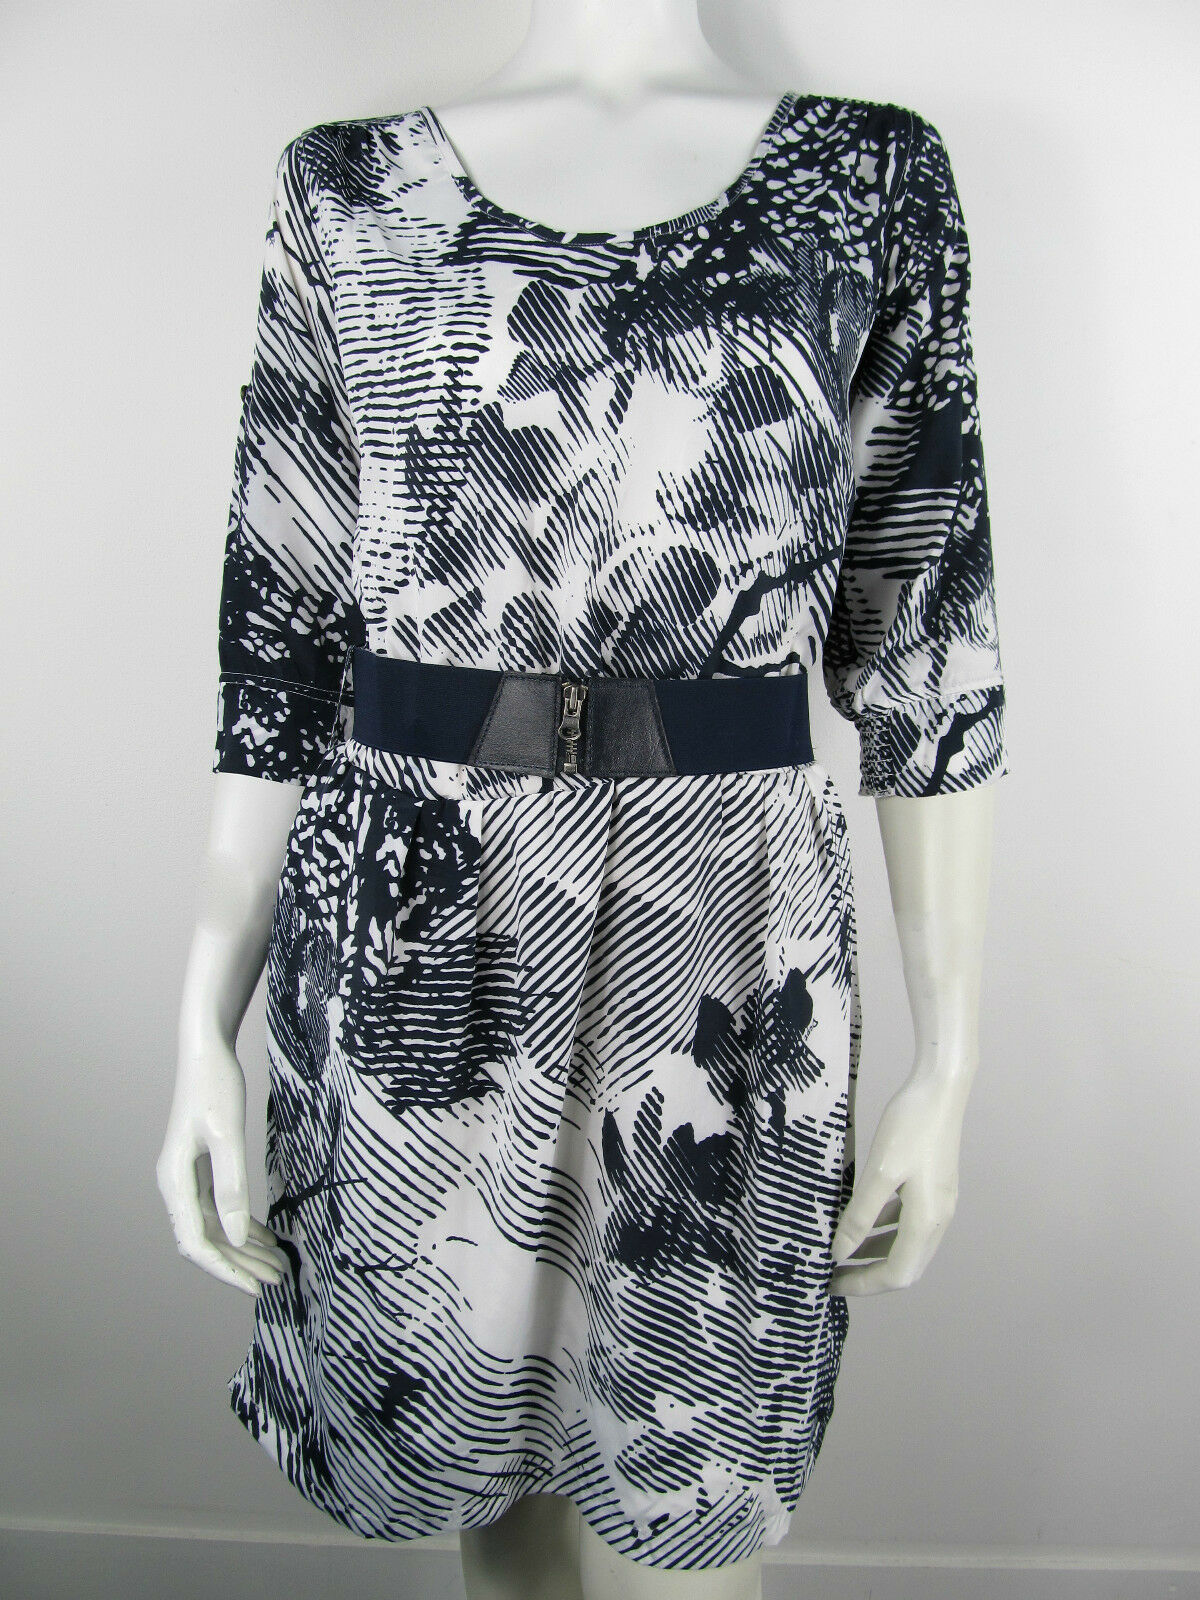 Dept Kleed Kleid Dress Jurk Tunika 008 Whisper White Neu M L